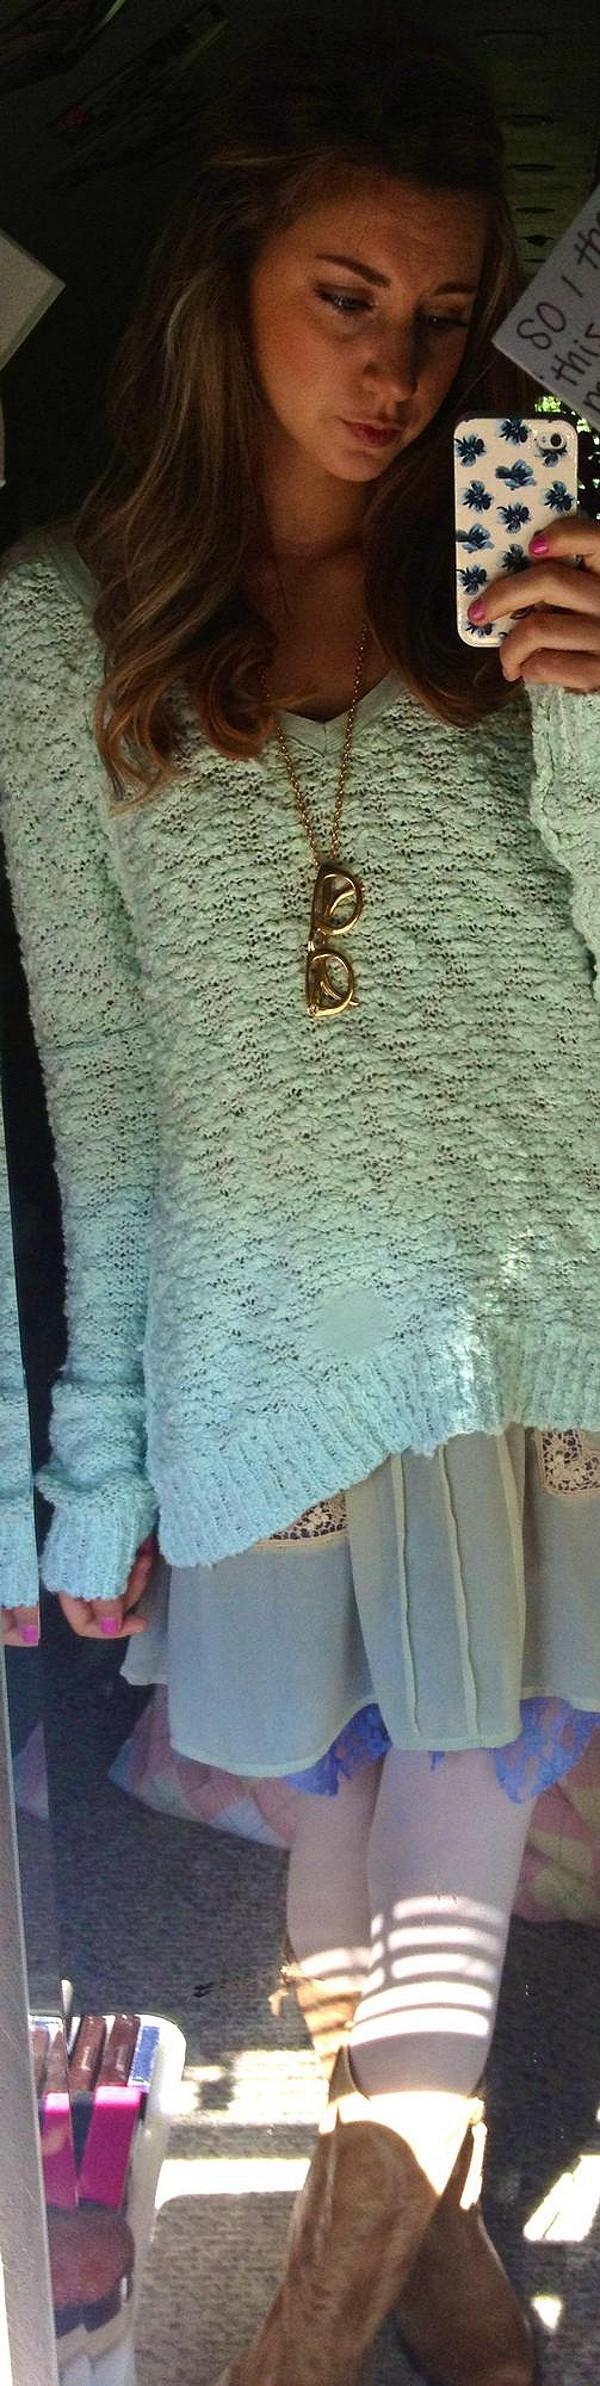 My Favorite Mint Sweater!